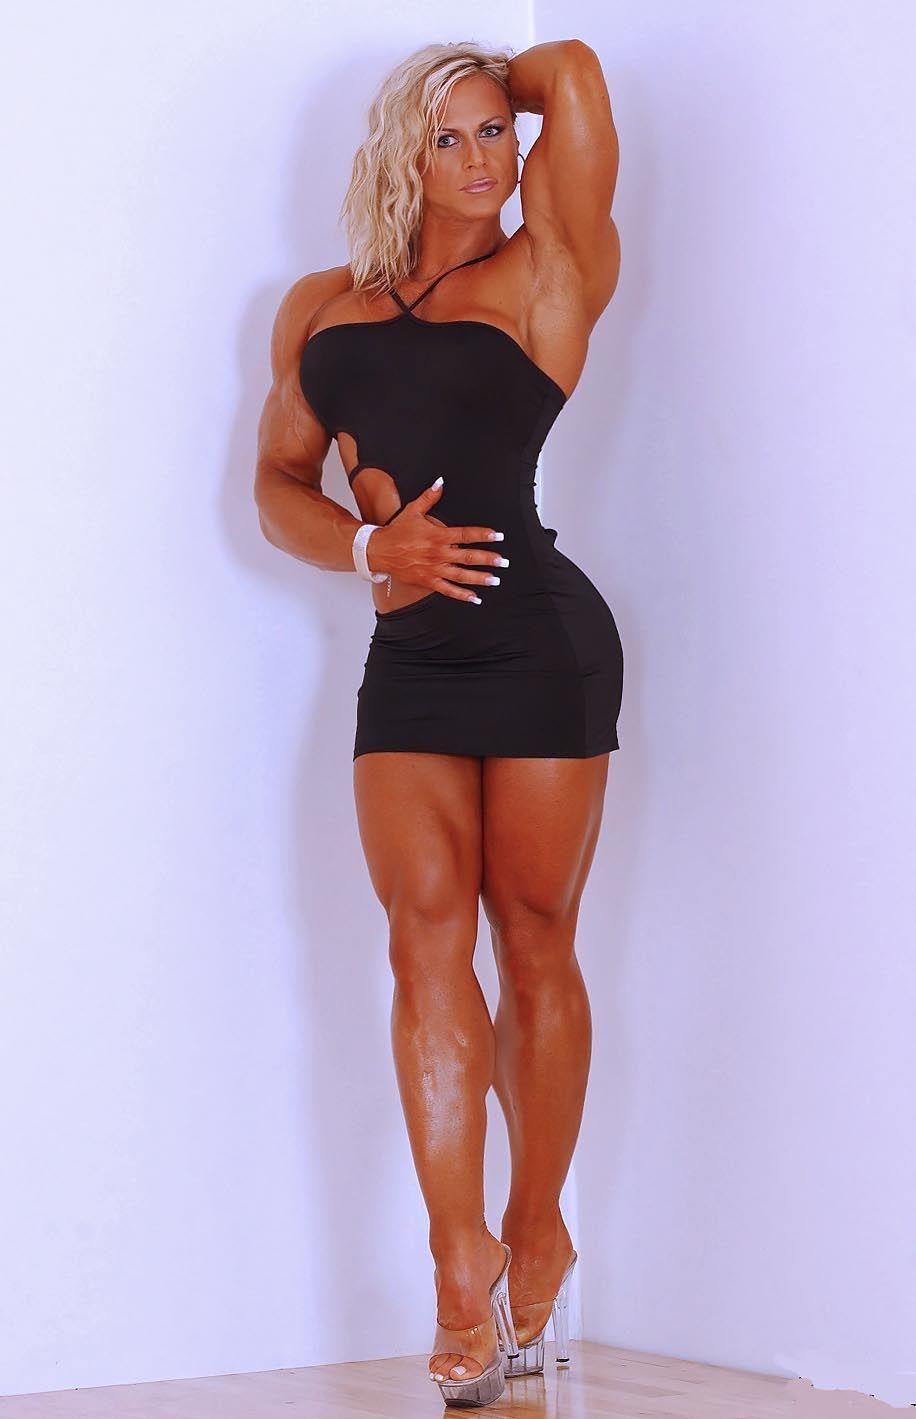 Cass Martin | Mädchen training, Model training, Frauen muskeln